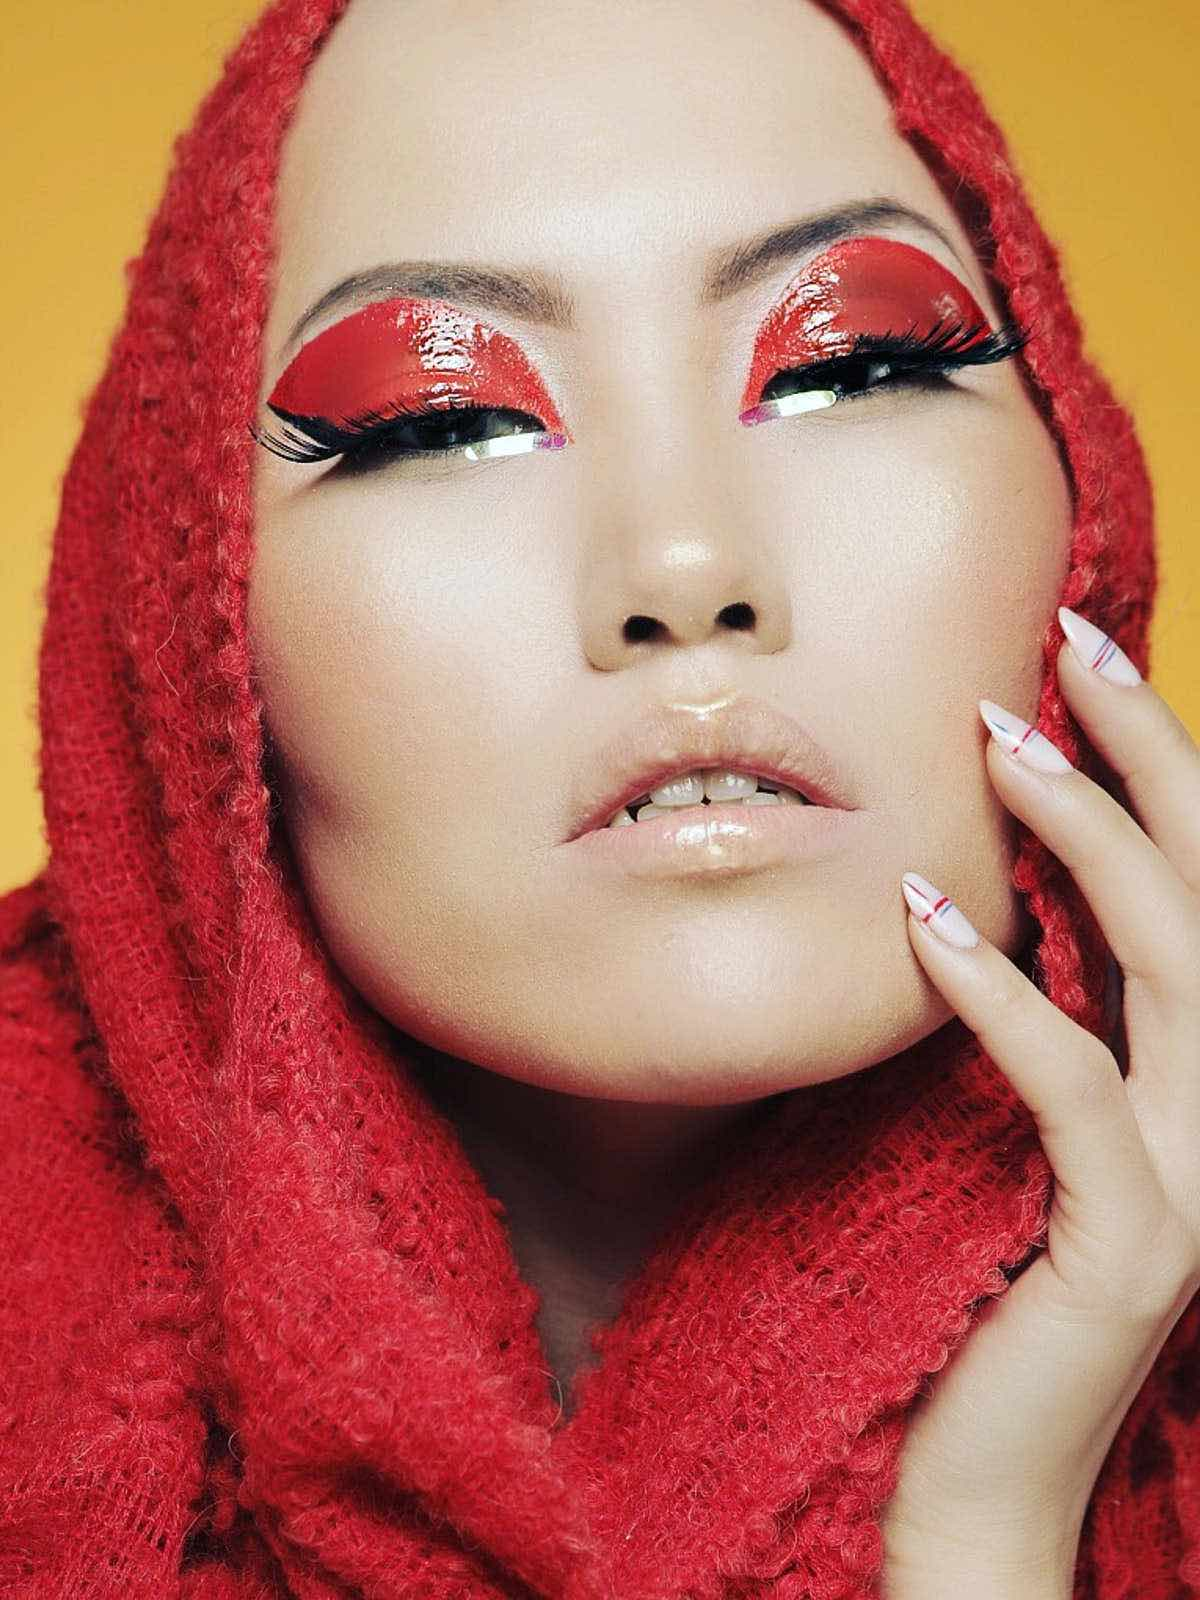 sce-agency-female-model-tia-b-6aaaa